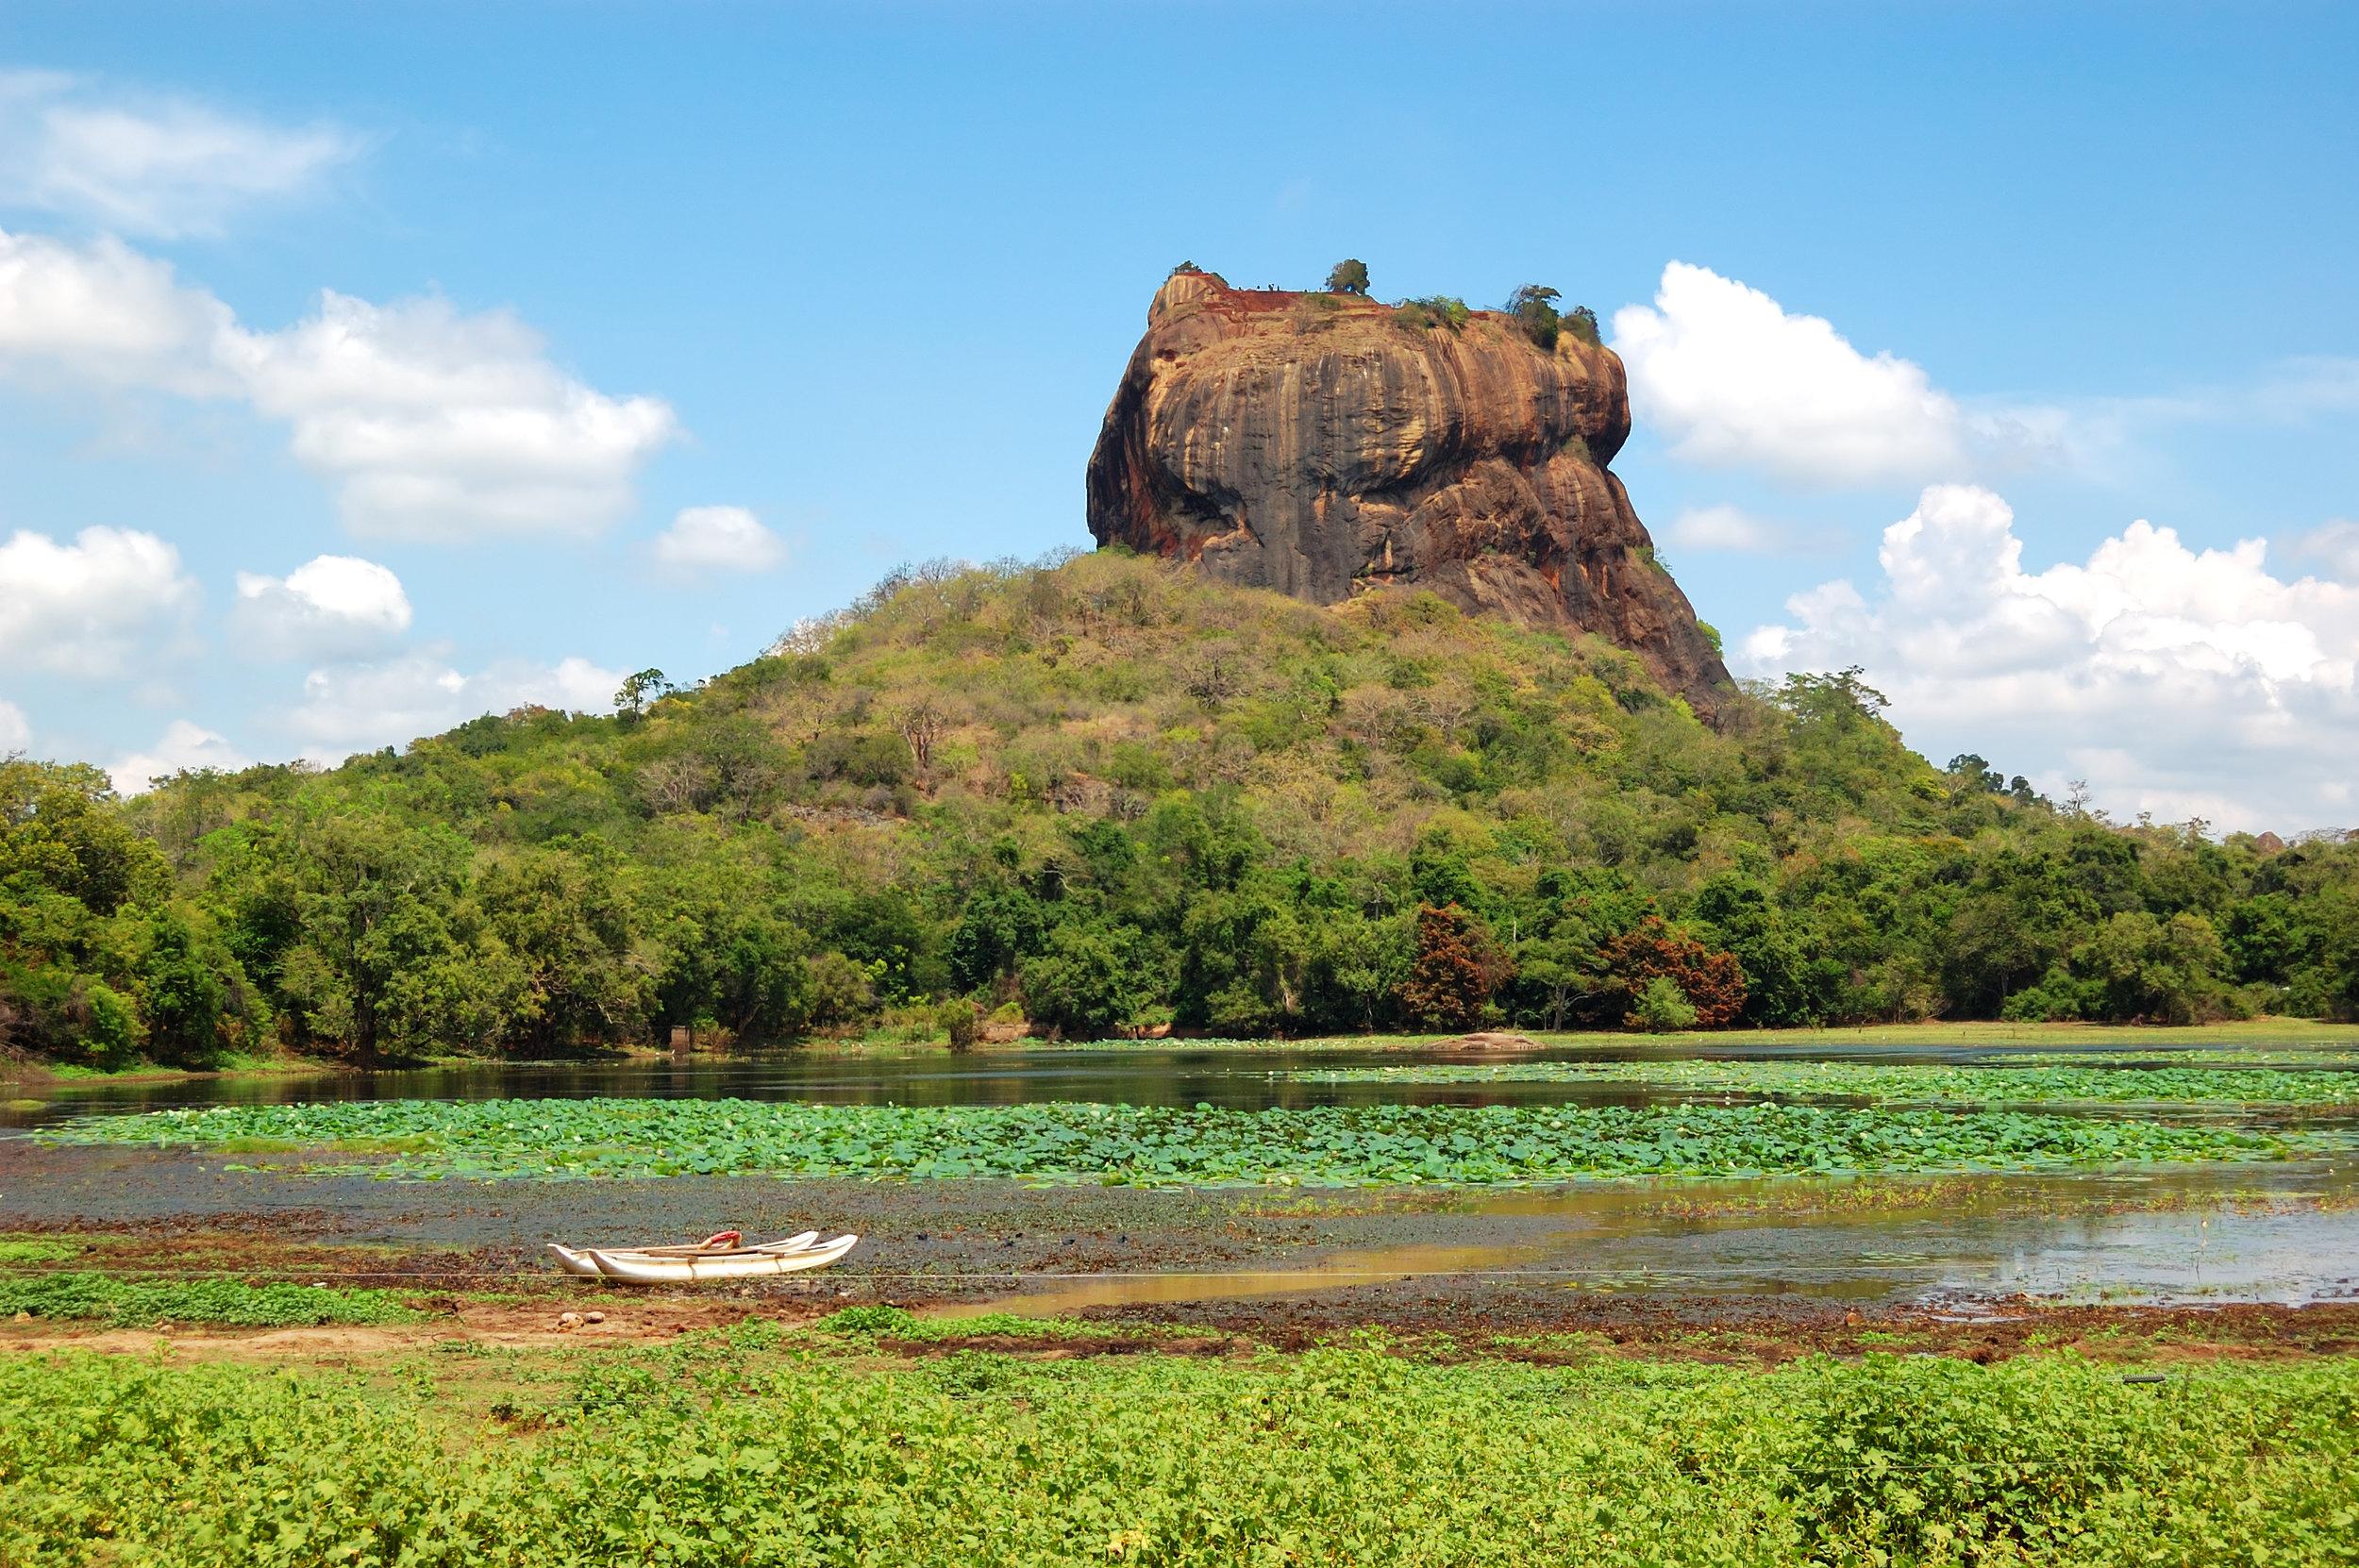 srilanka_lionsrock_bigstock-The-Sigiriya-lion-s-Rock-Is--50105372.jpg